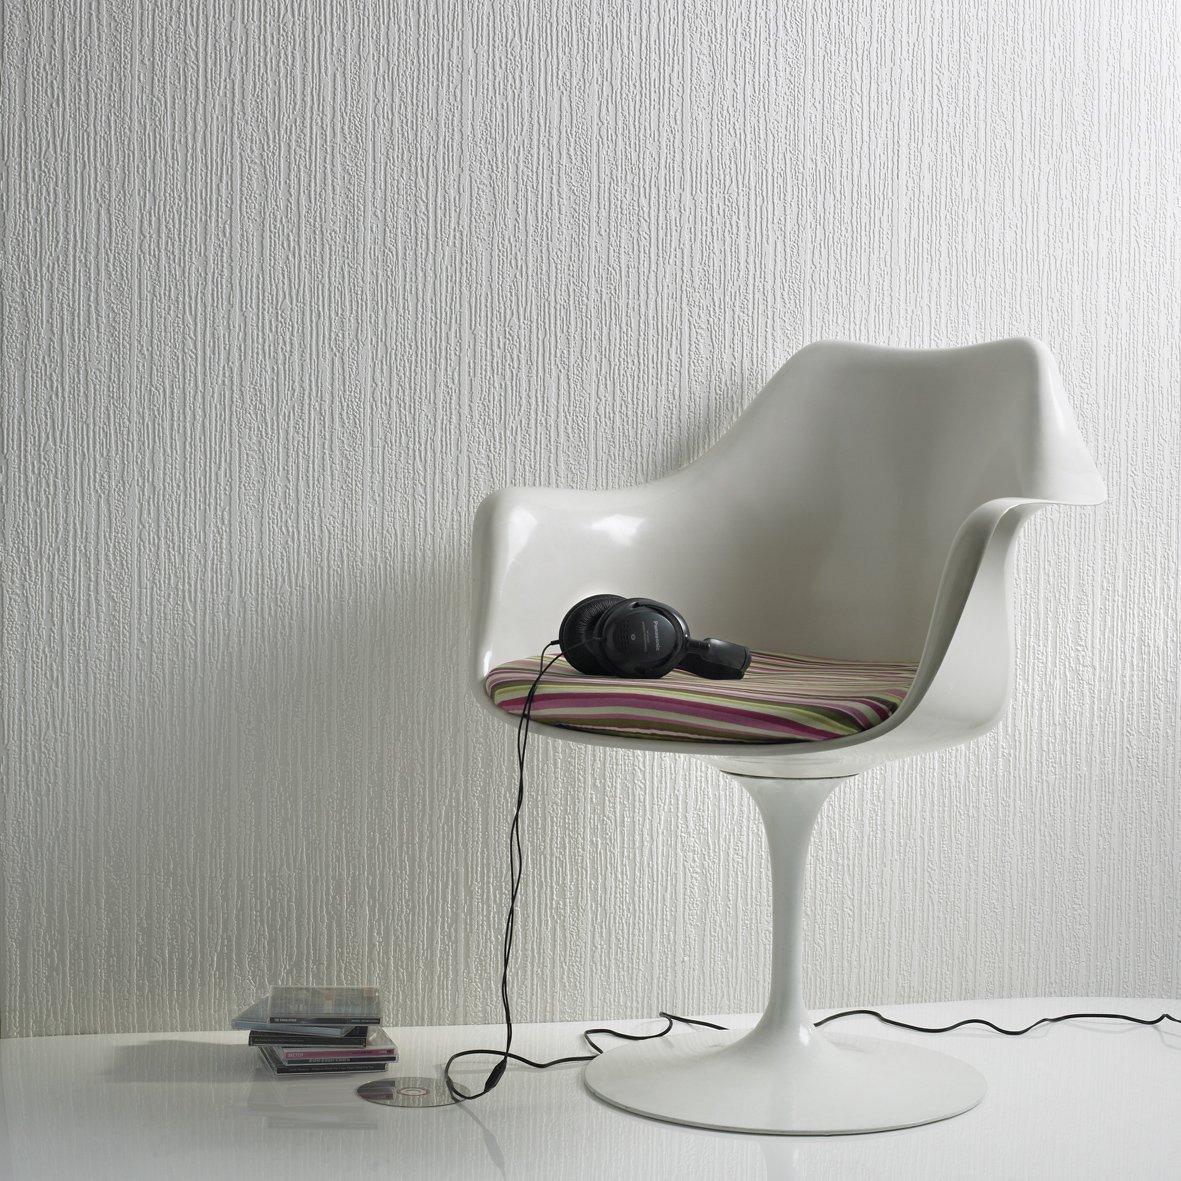 Textured paintable wallpaper - Superfresco Paintable Textured Bark Effect Wallpaper Amazon Co Uk Kitchen Home